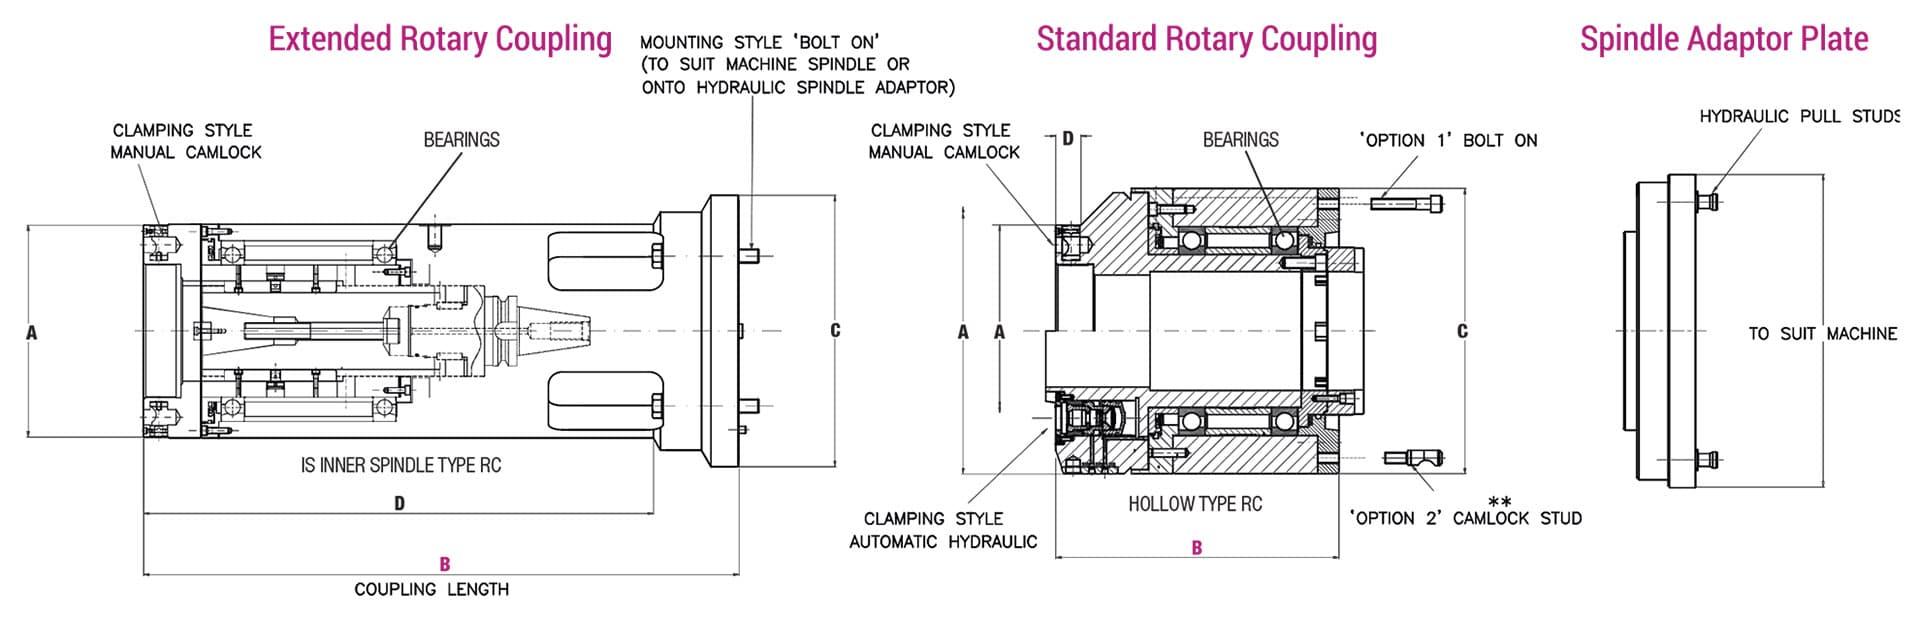 Rotary Coupling Diagram